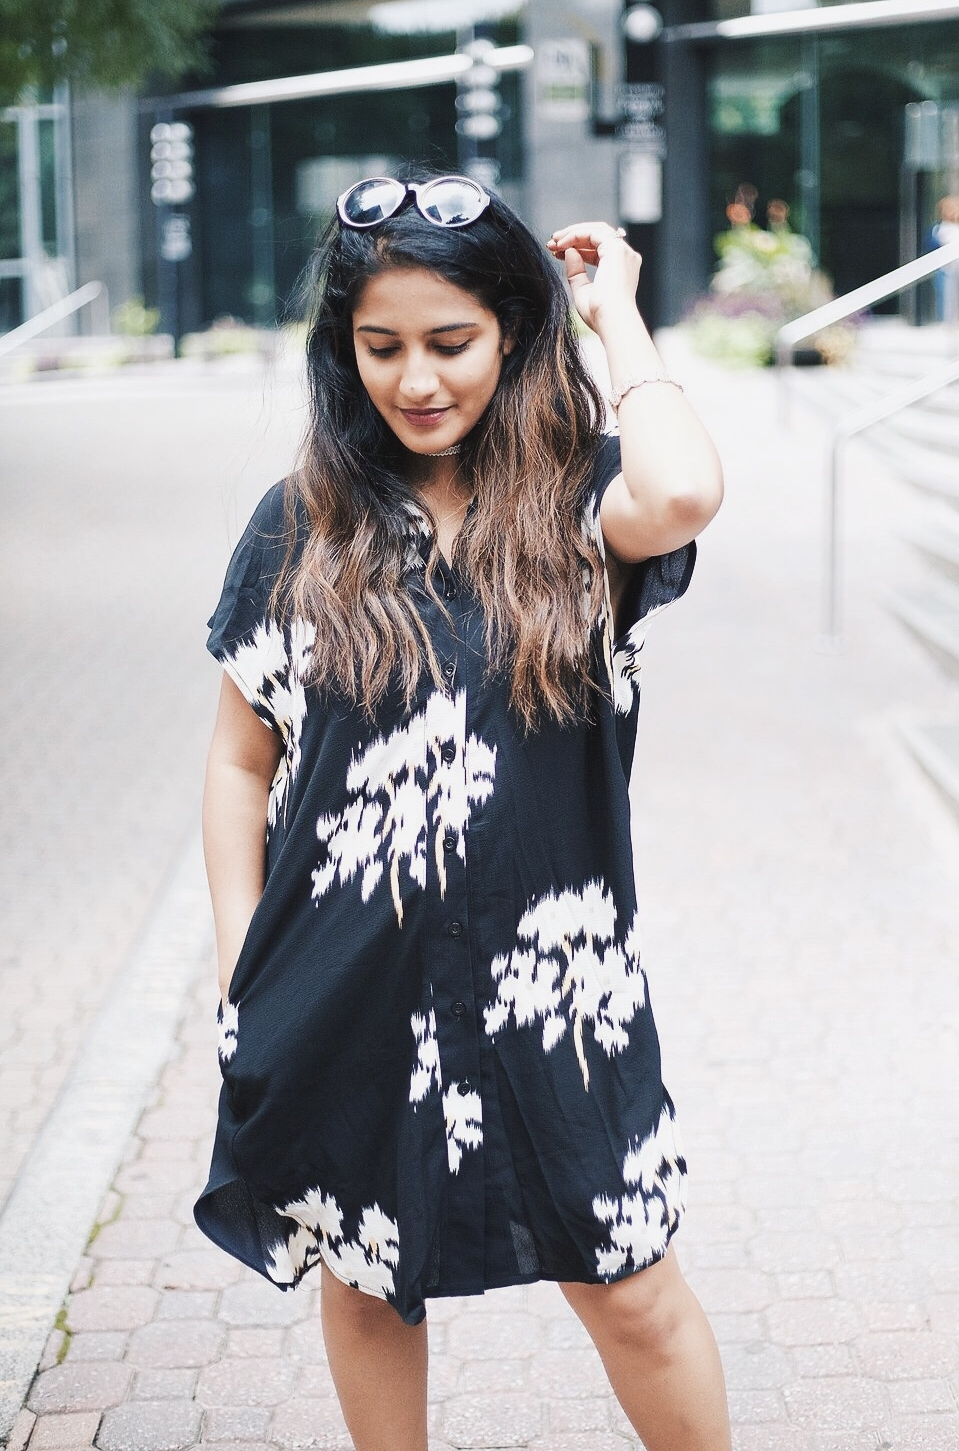 Floral Dress Make Me Chic.jpeg